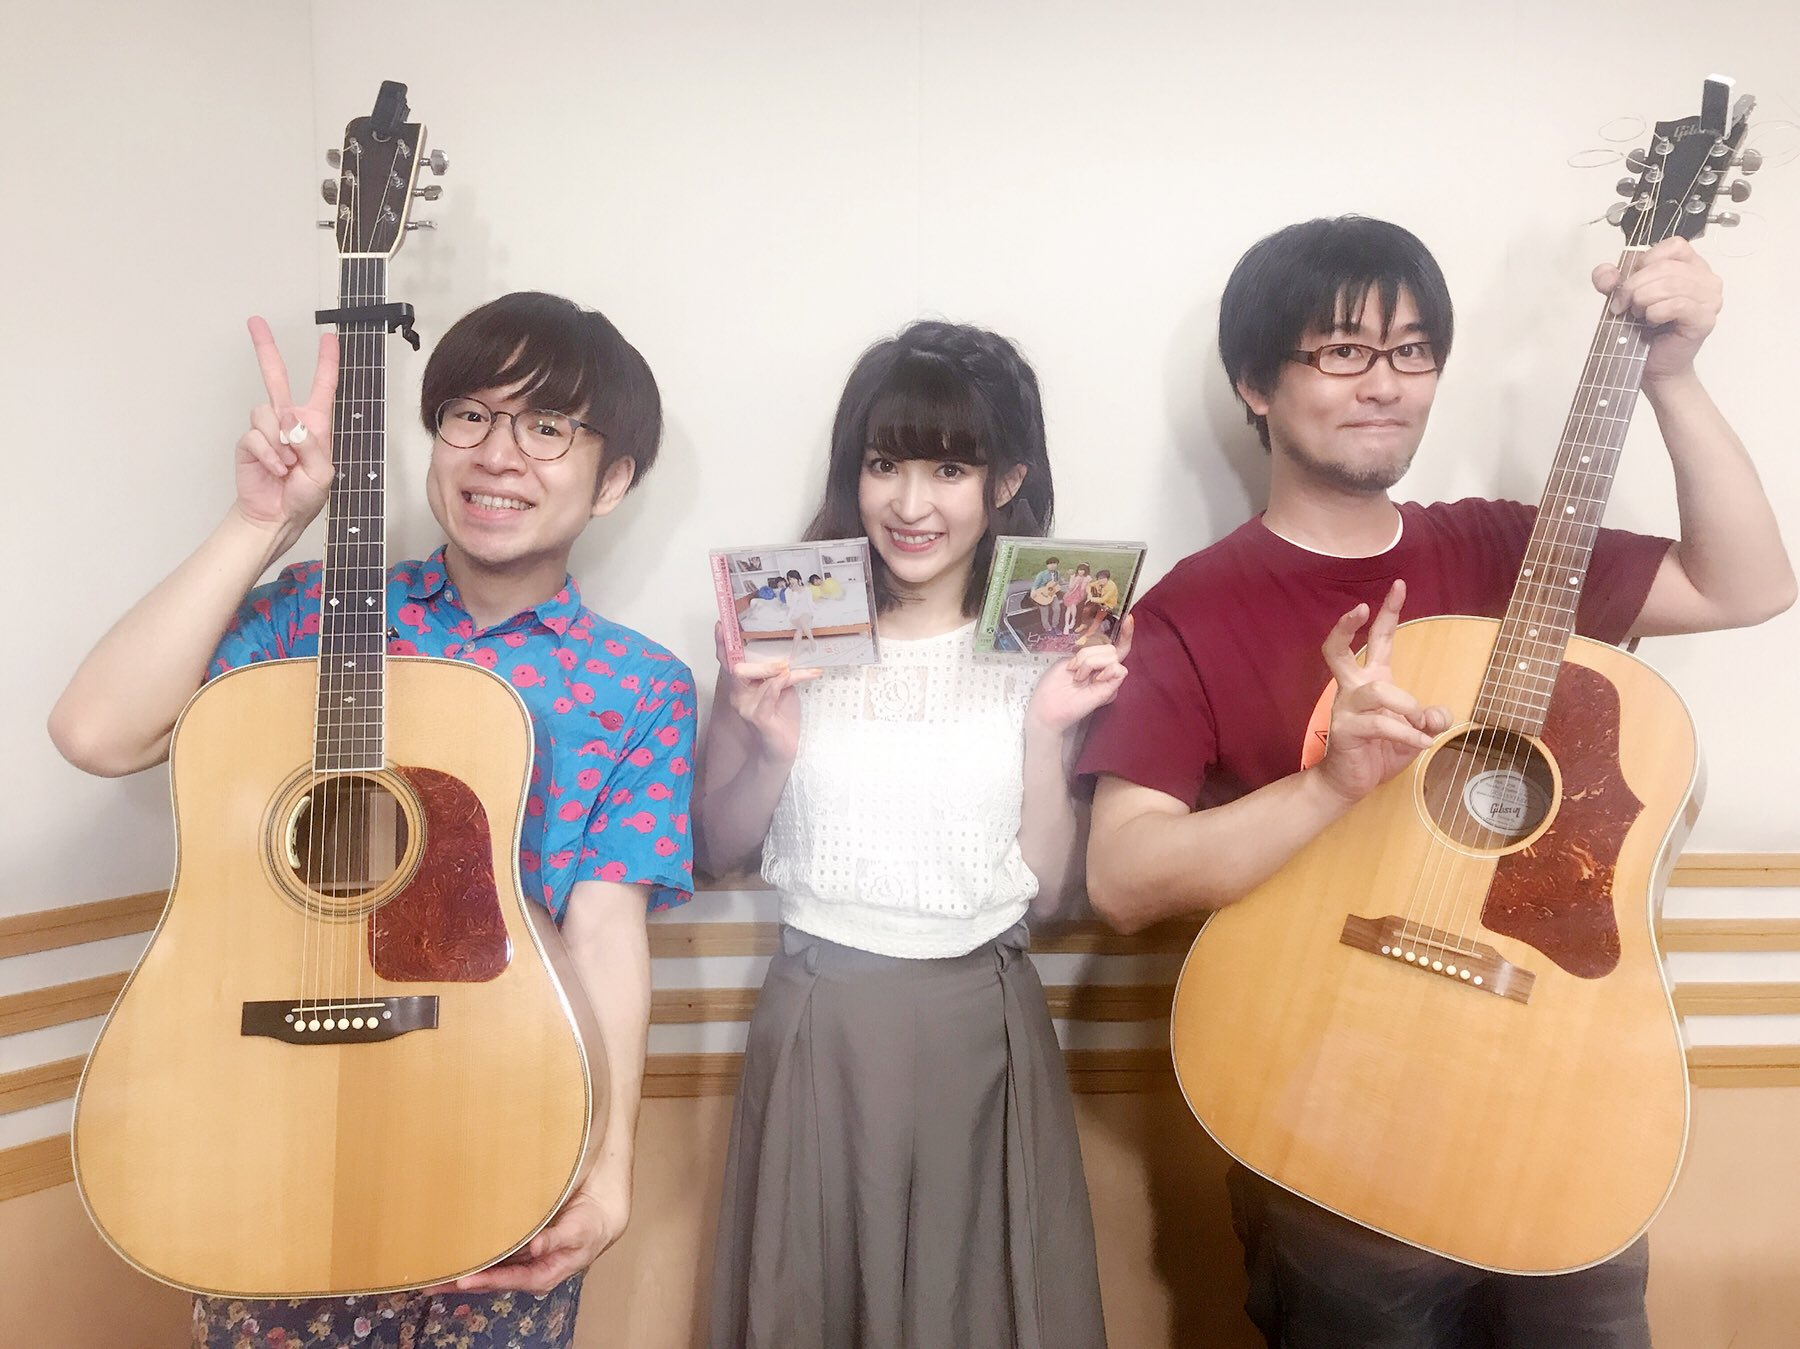 http://www.joqr.co.jp/yonayona/%E3%82%AA%E3%83%83%E3%83%89%E3%83%BB%E3%82%A2%E3%82%A4.jpg